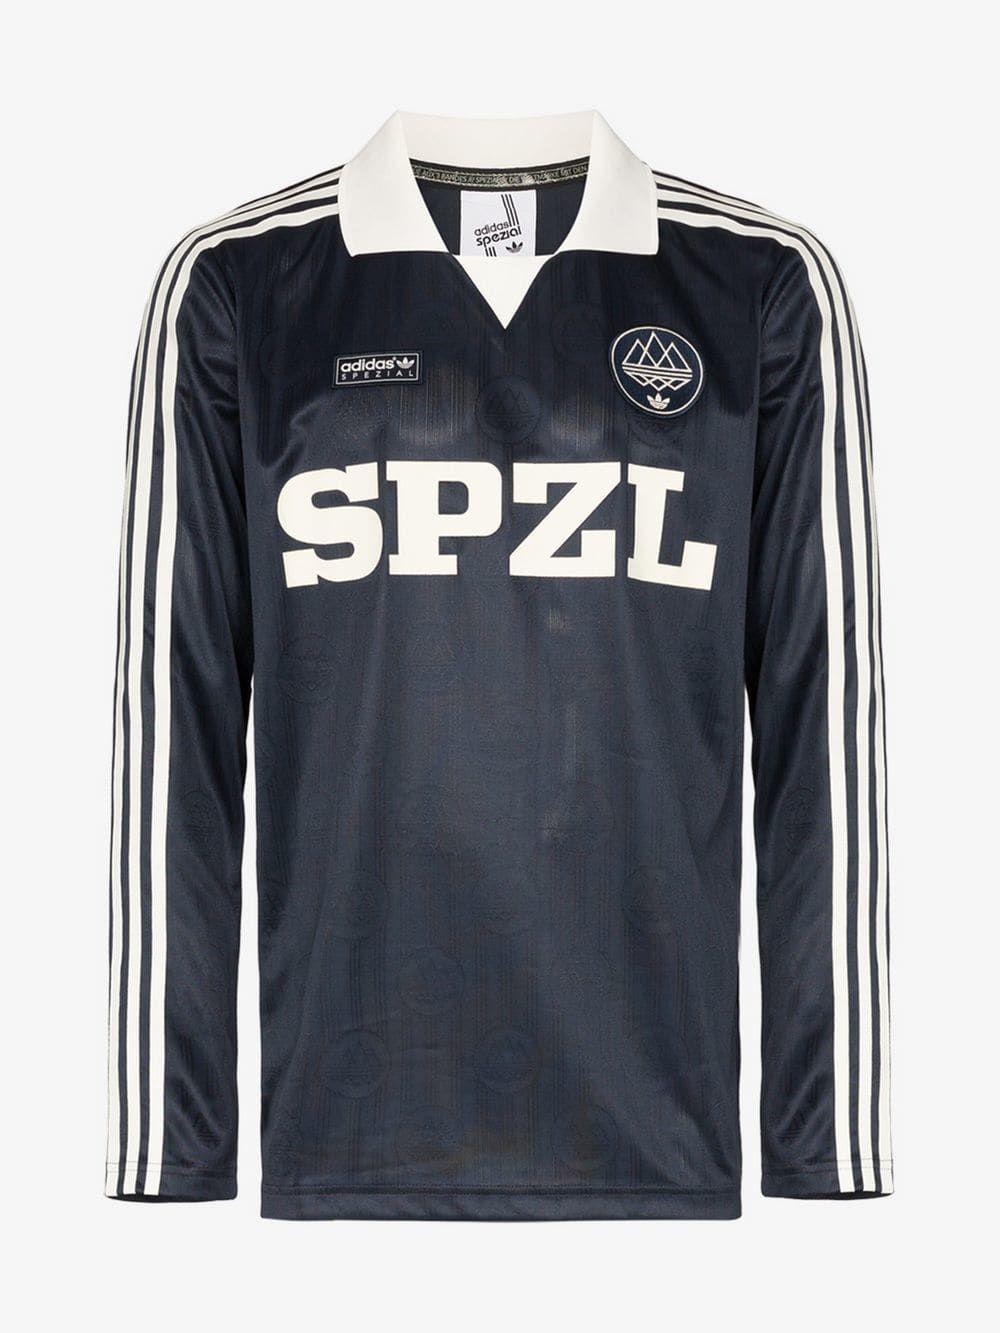 Adidas spezial, Striped polo shirt